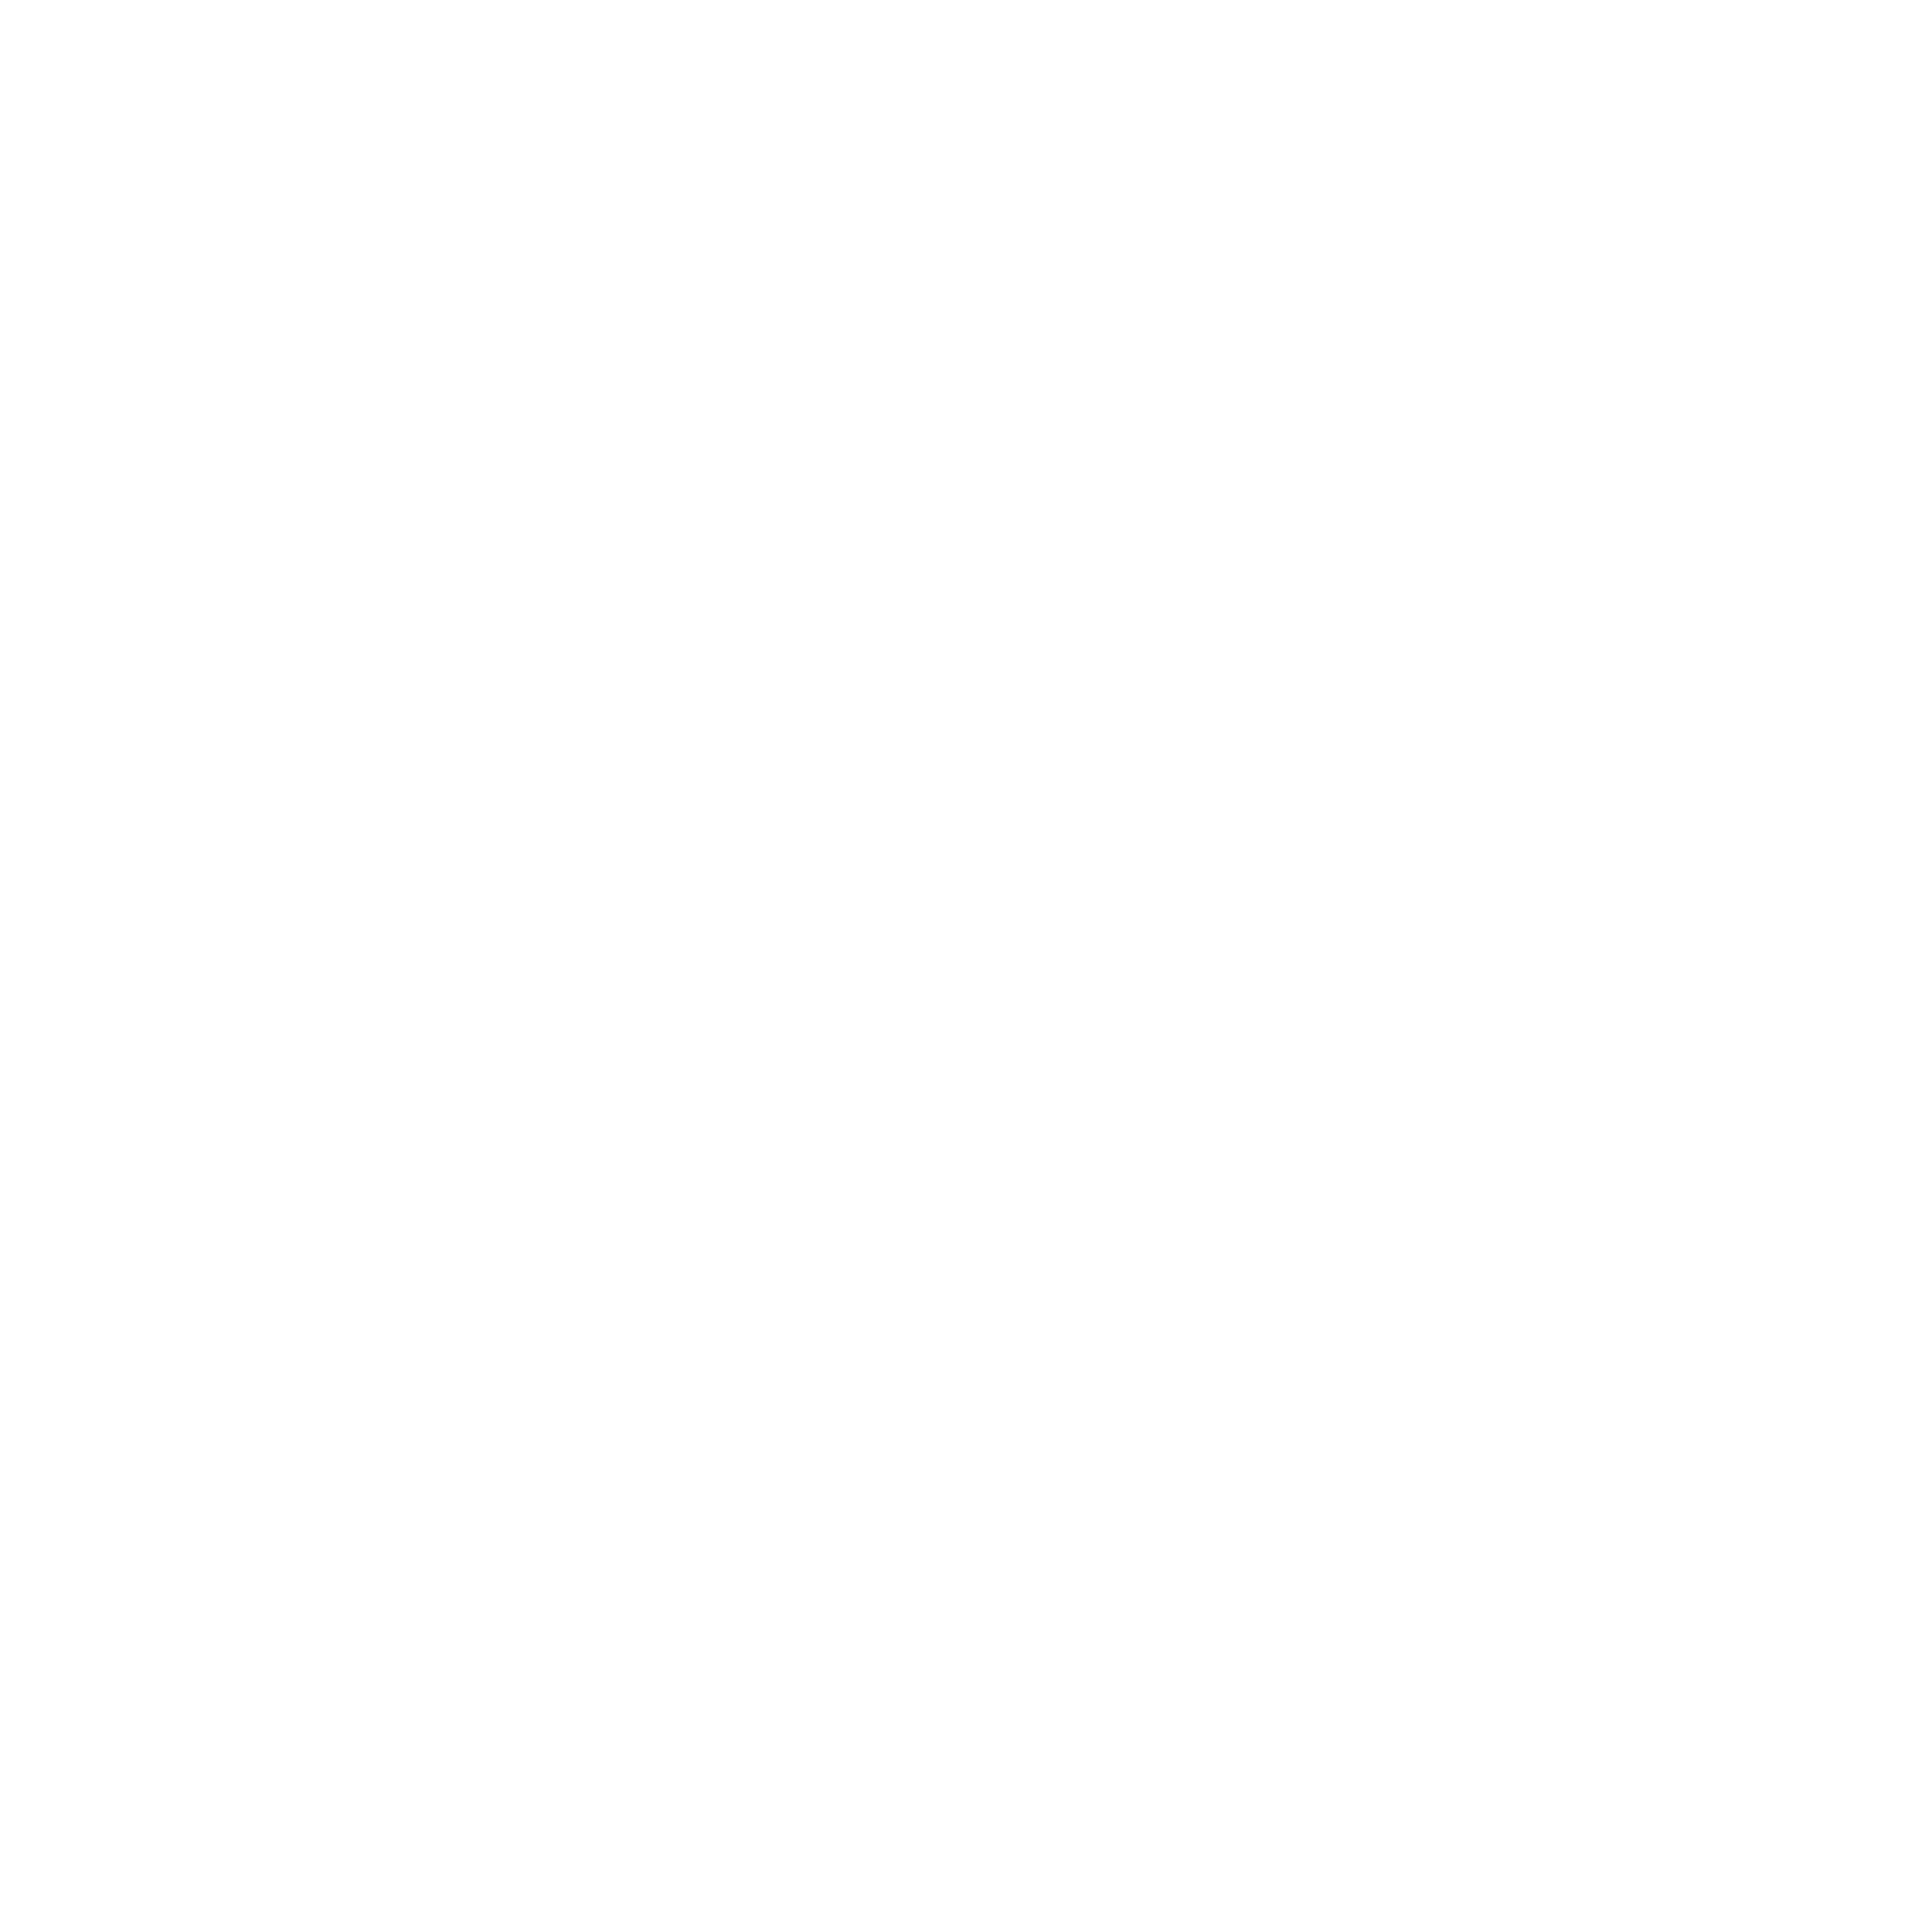 Aula Records